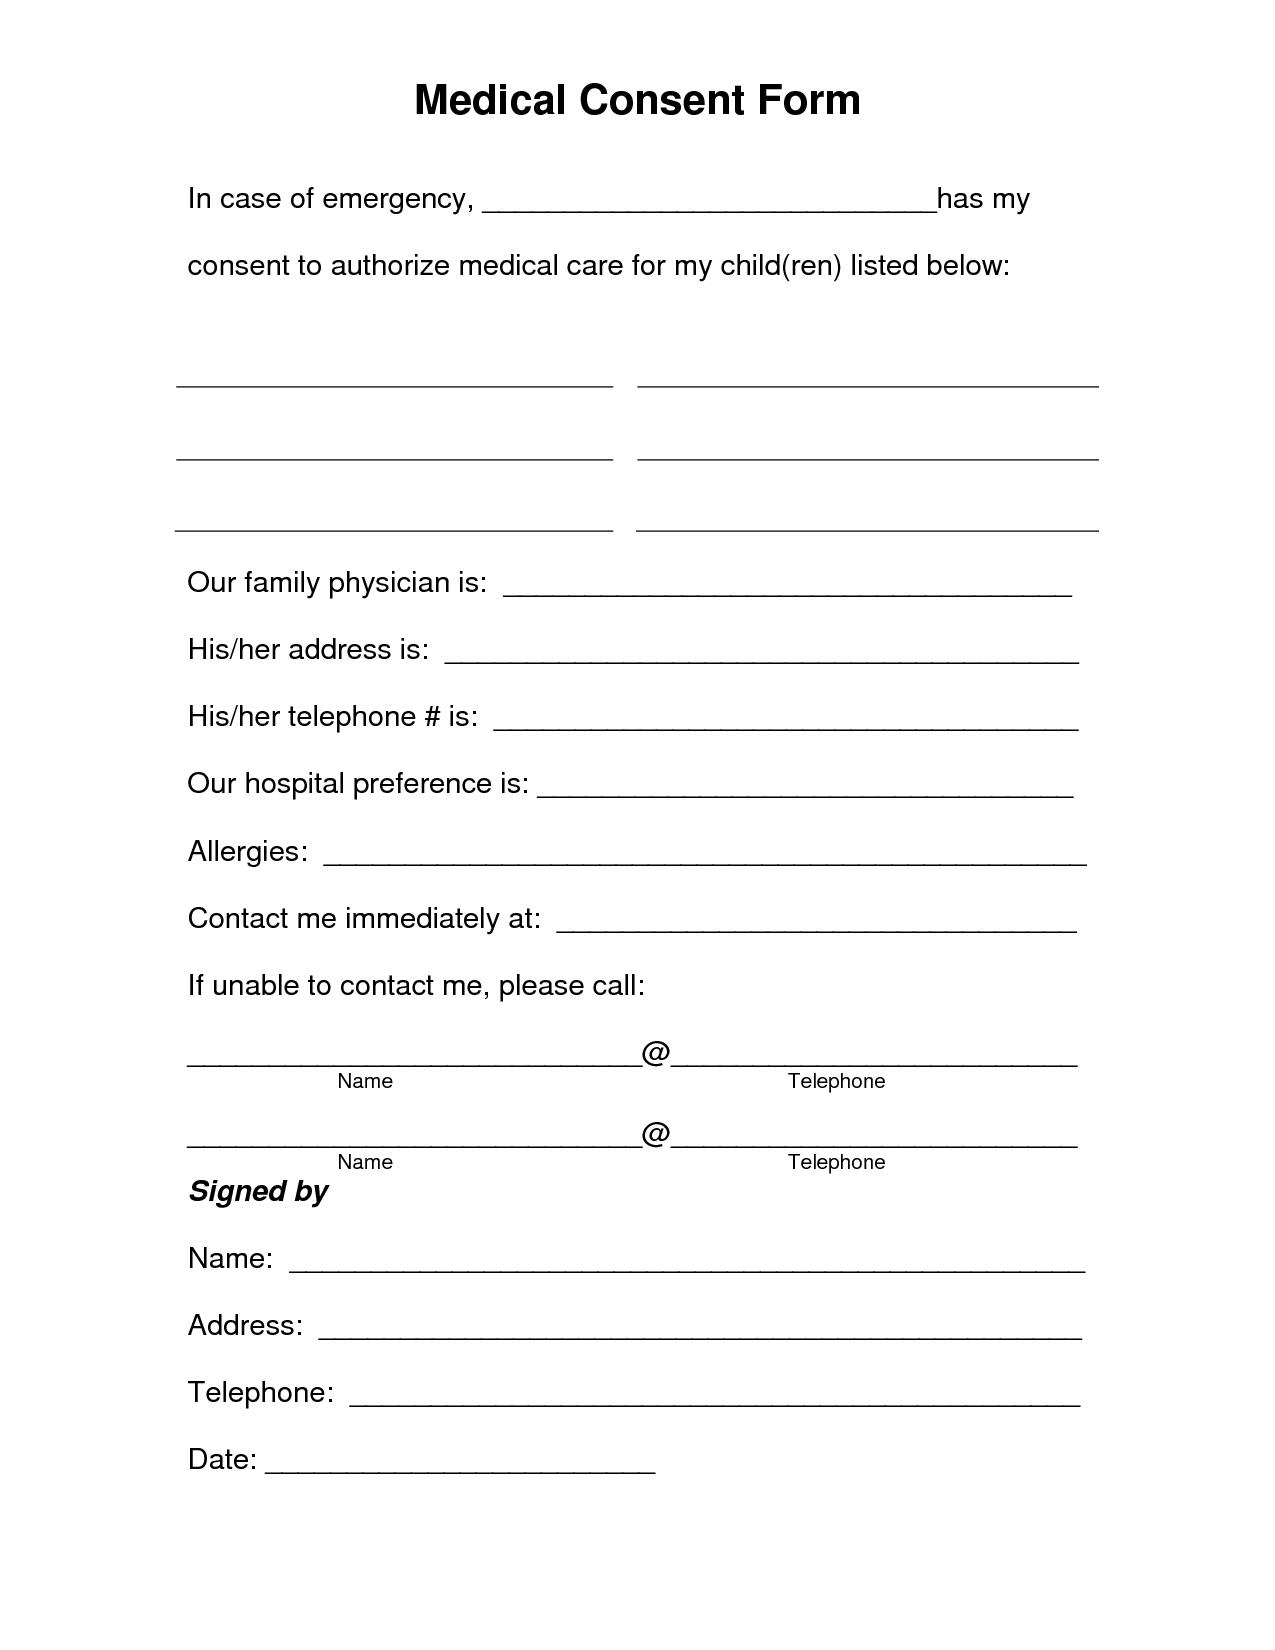 Medical Release Form Template 30 Medical Release Form